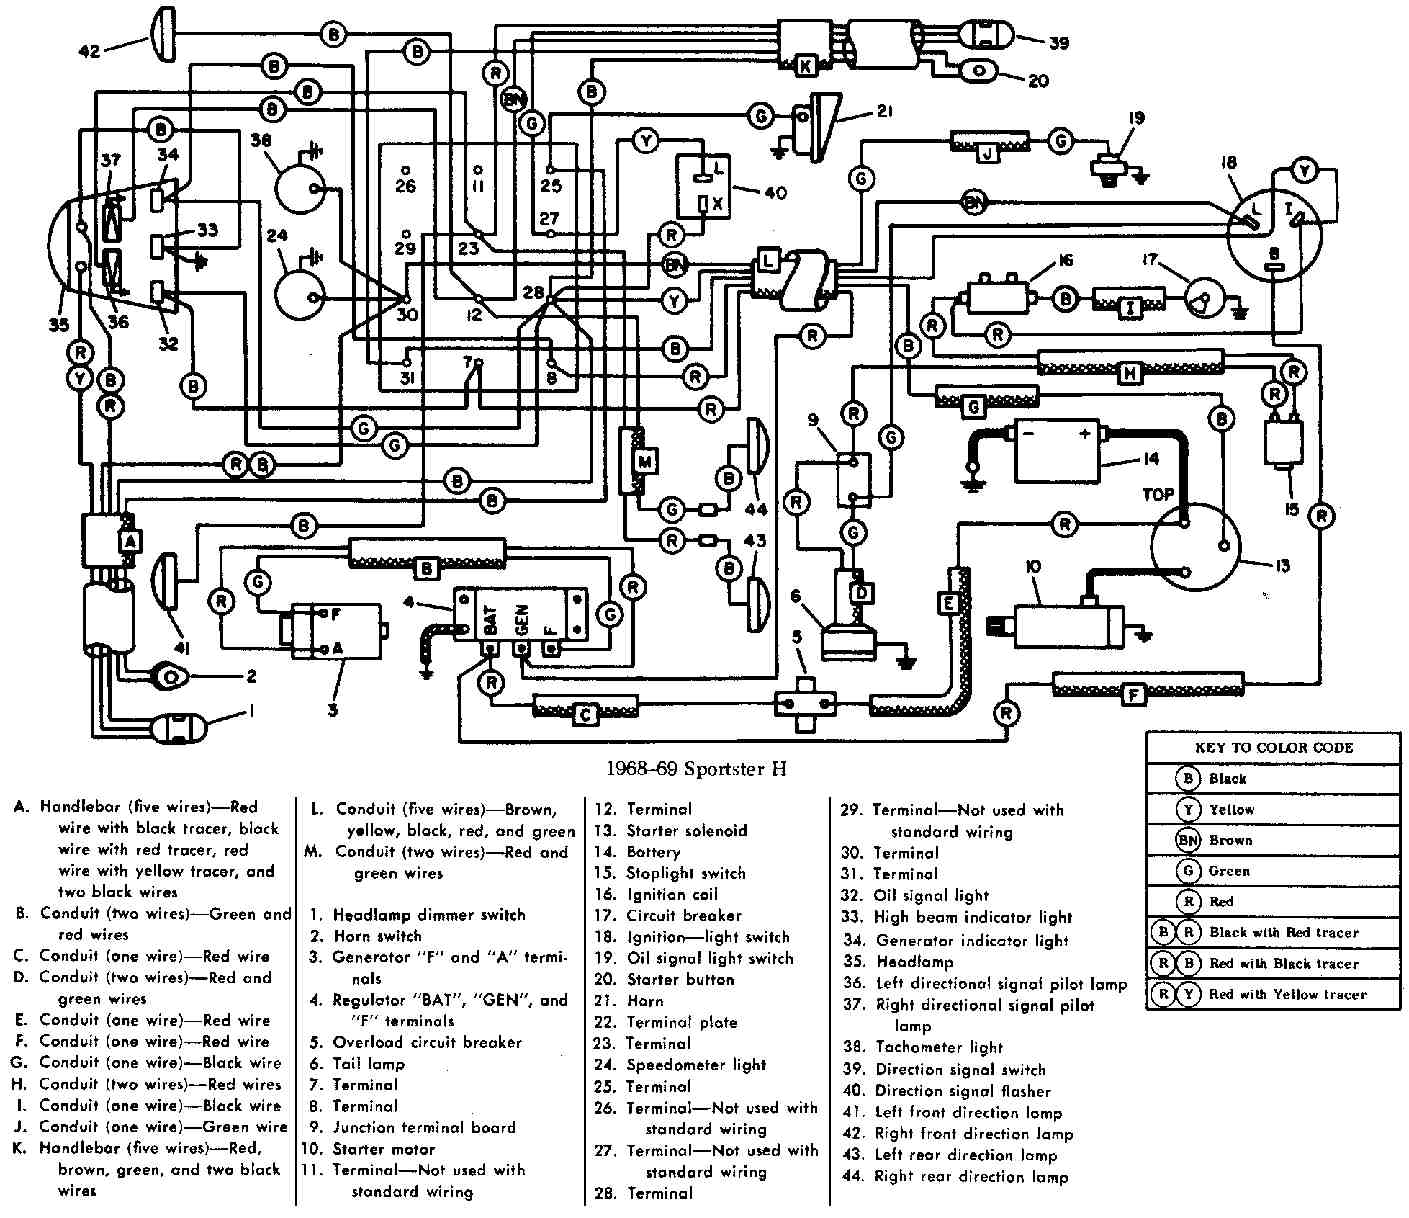 1986 Harley Sportster Wiring Diagram - Honeywell Oil Furnace Wiring Diagrams  for Wiring Diagram Schematics [ 1218 x 1409 Pixel ]